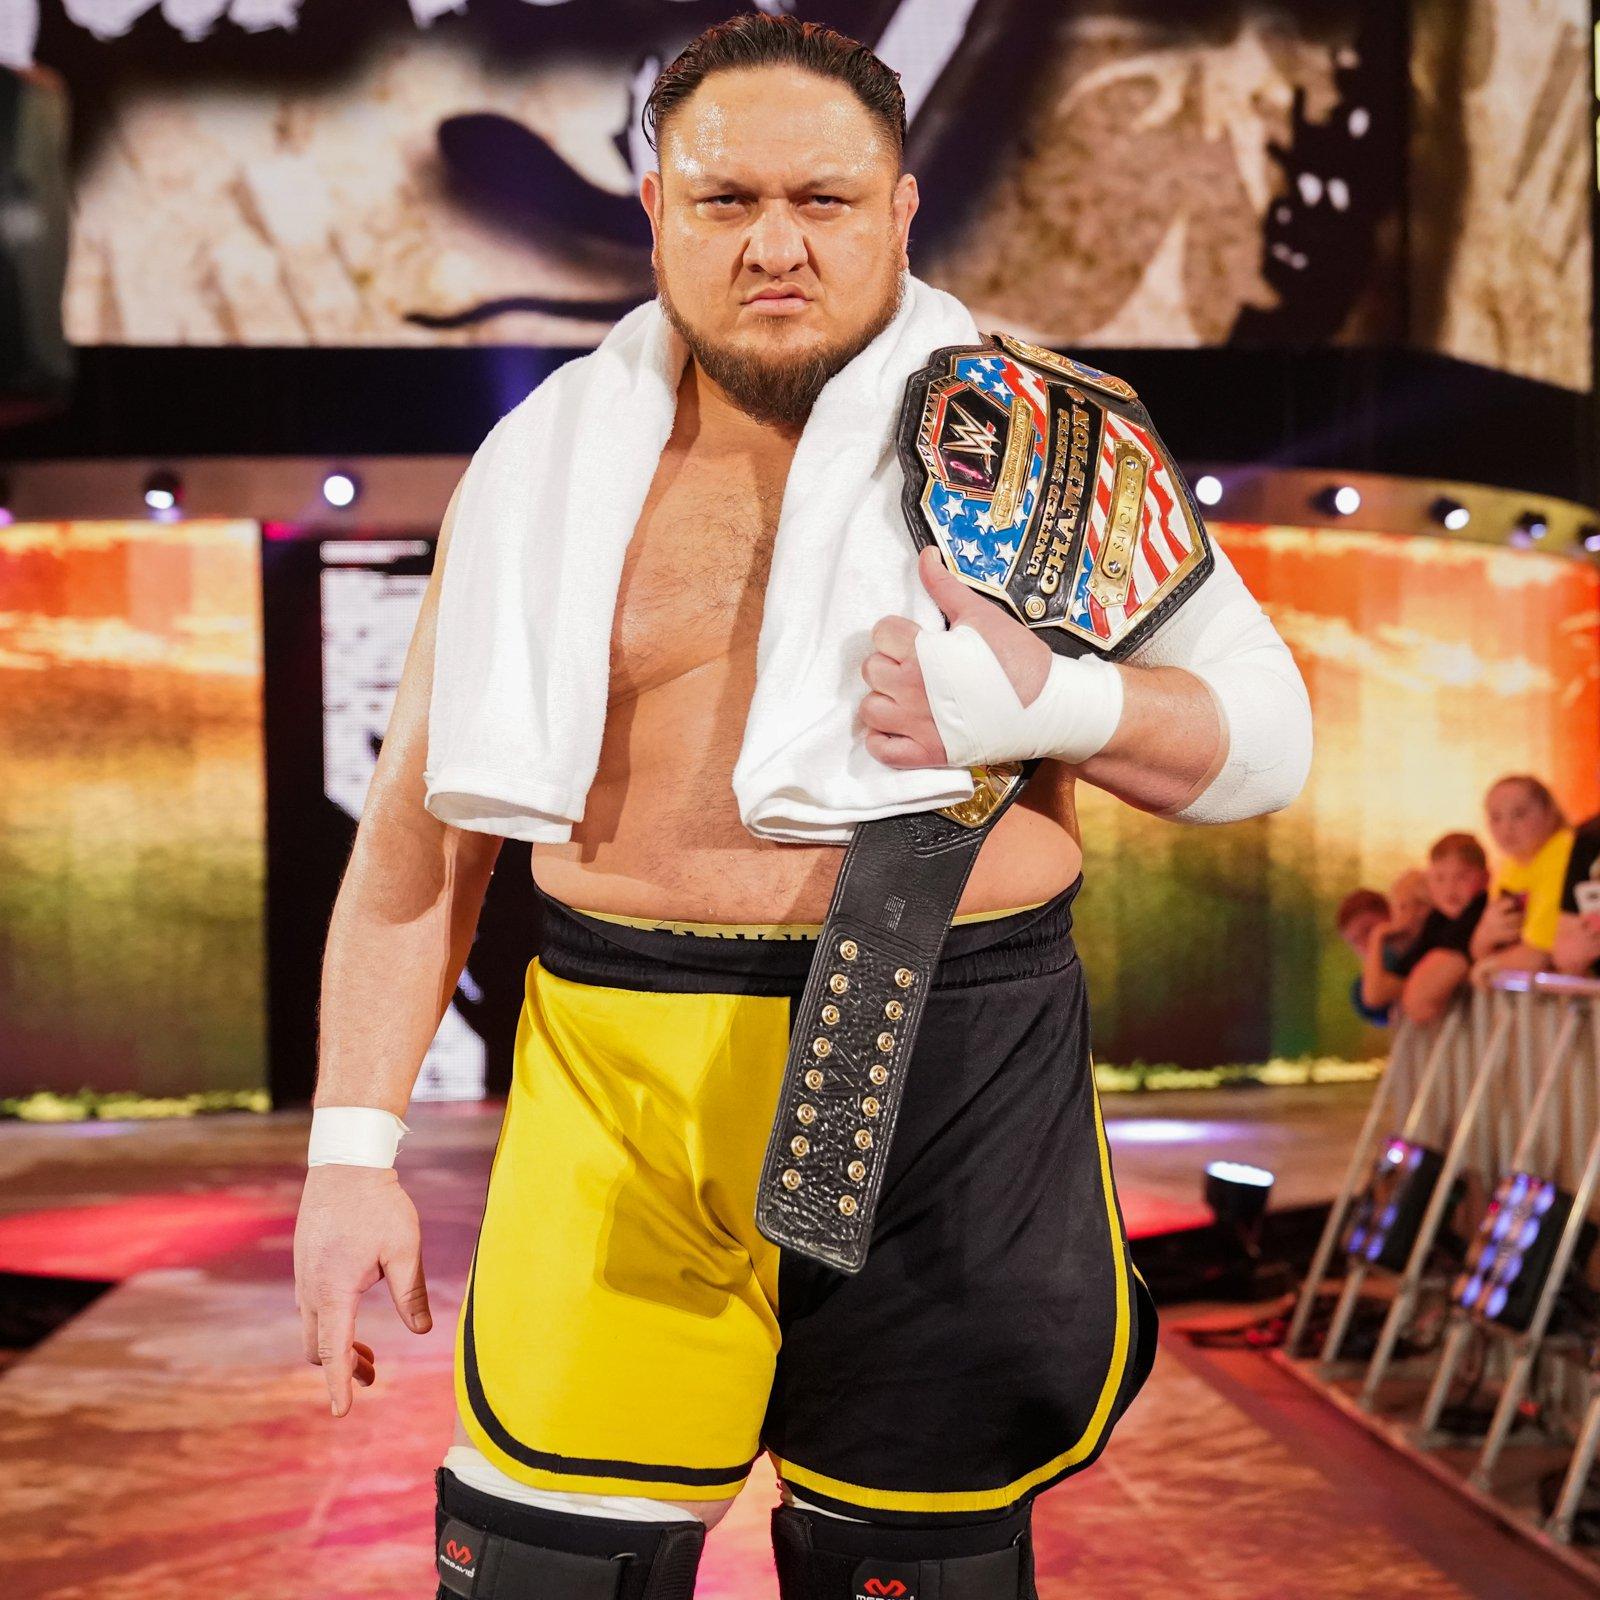 United States Champion Samoa Joe stalks to the ring to take on Kofi.